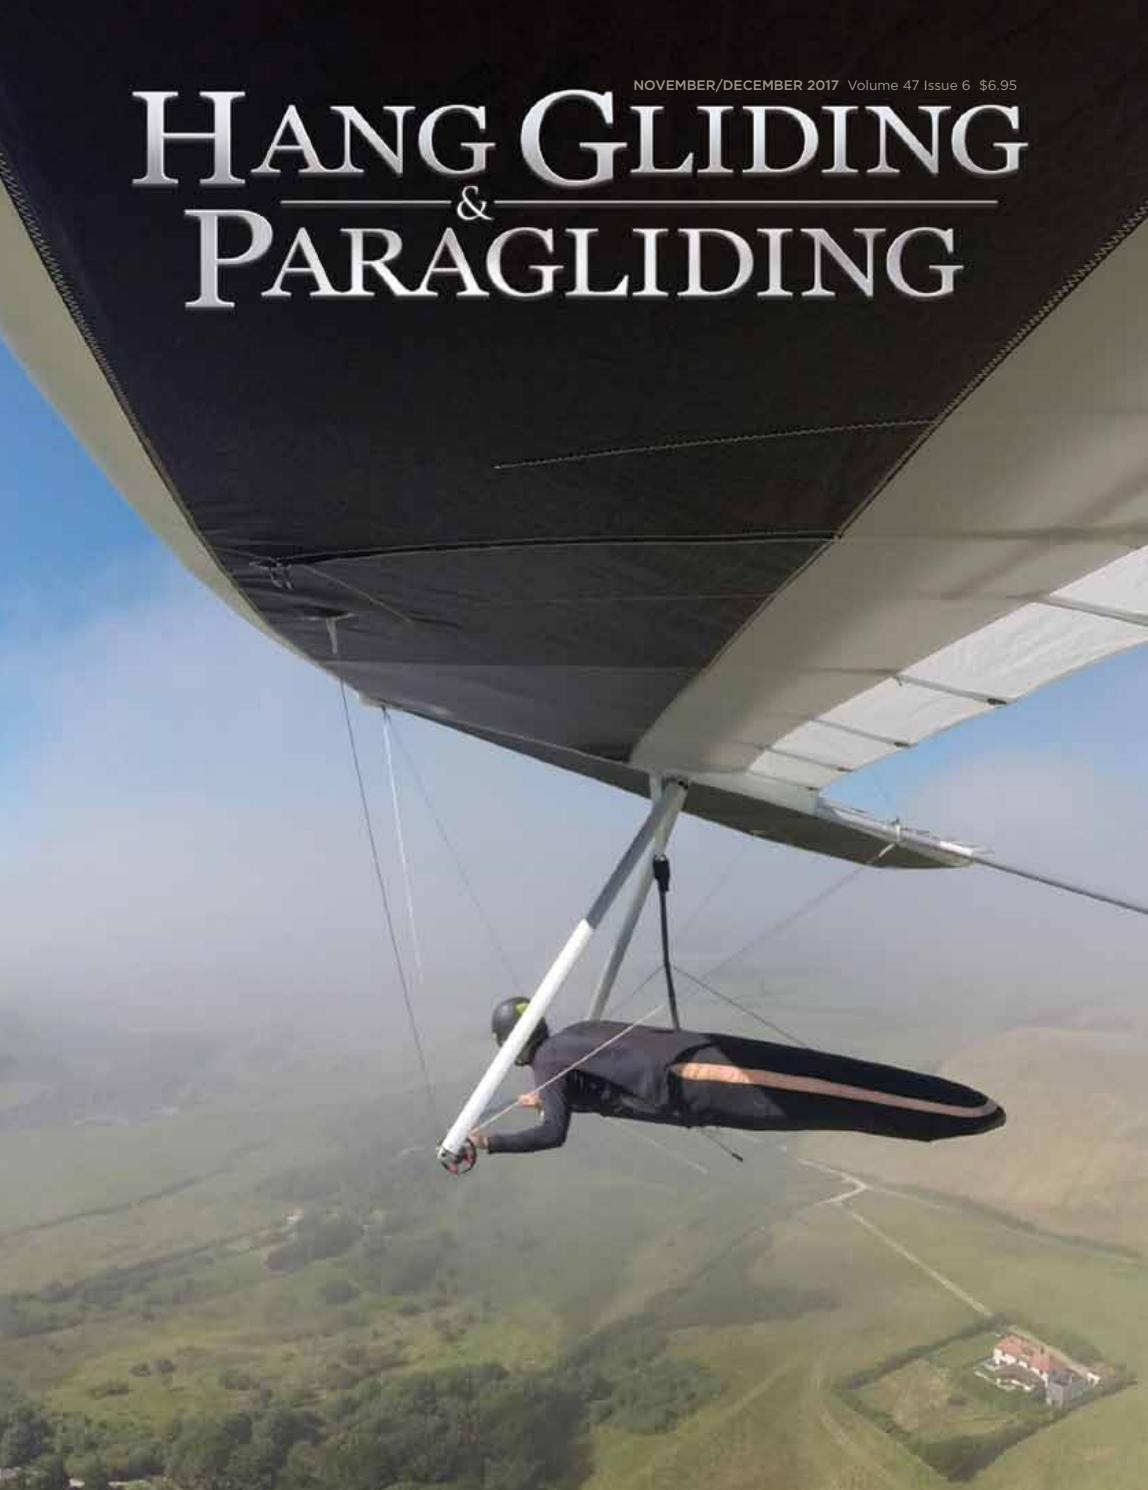 Hang Gliding & Paragliding Vol47-Iss6 Nov-Dec 2017 by US Hang